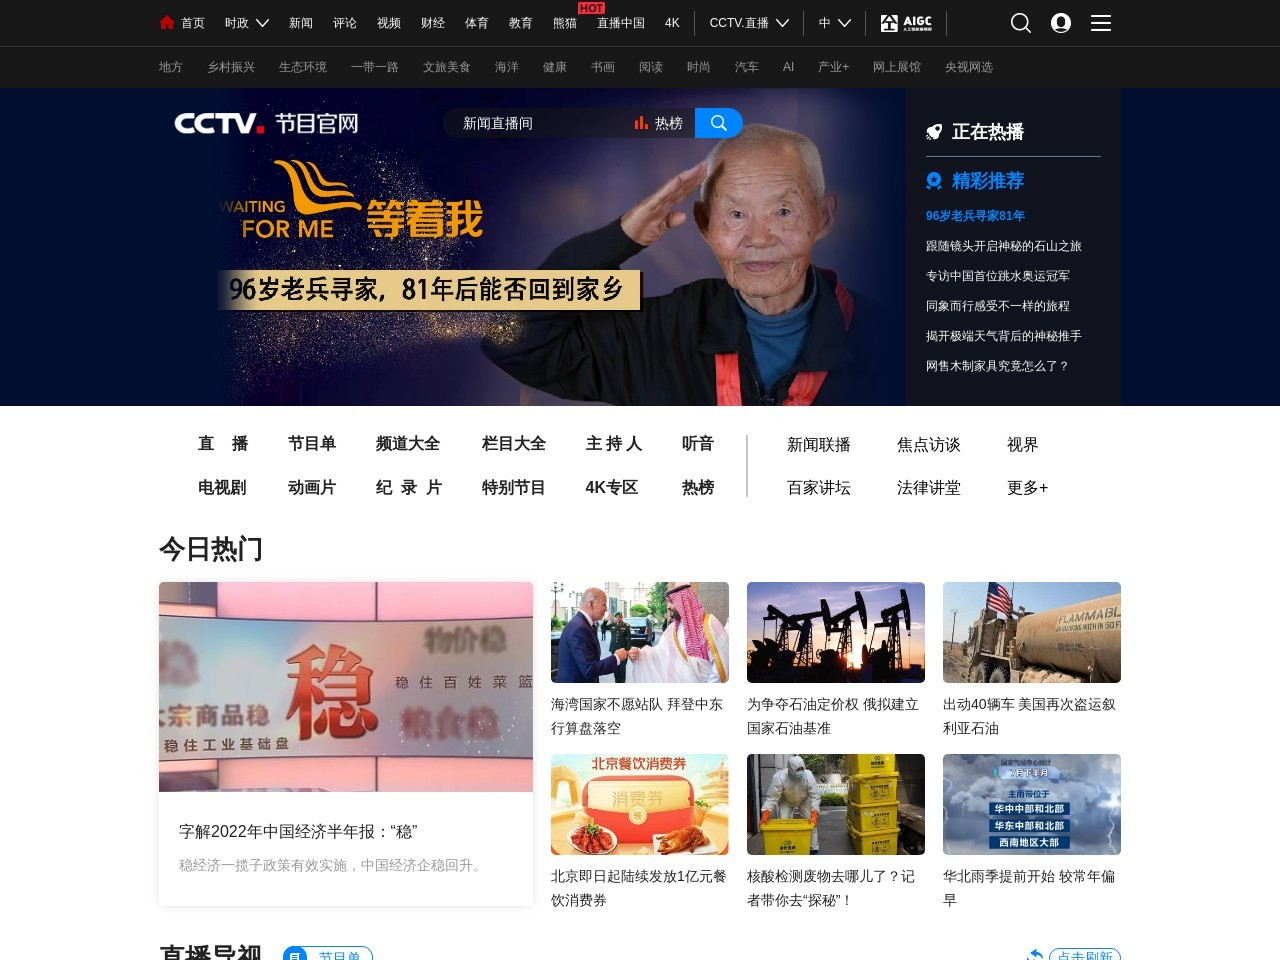 CCTV央视网-中国中央电视台